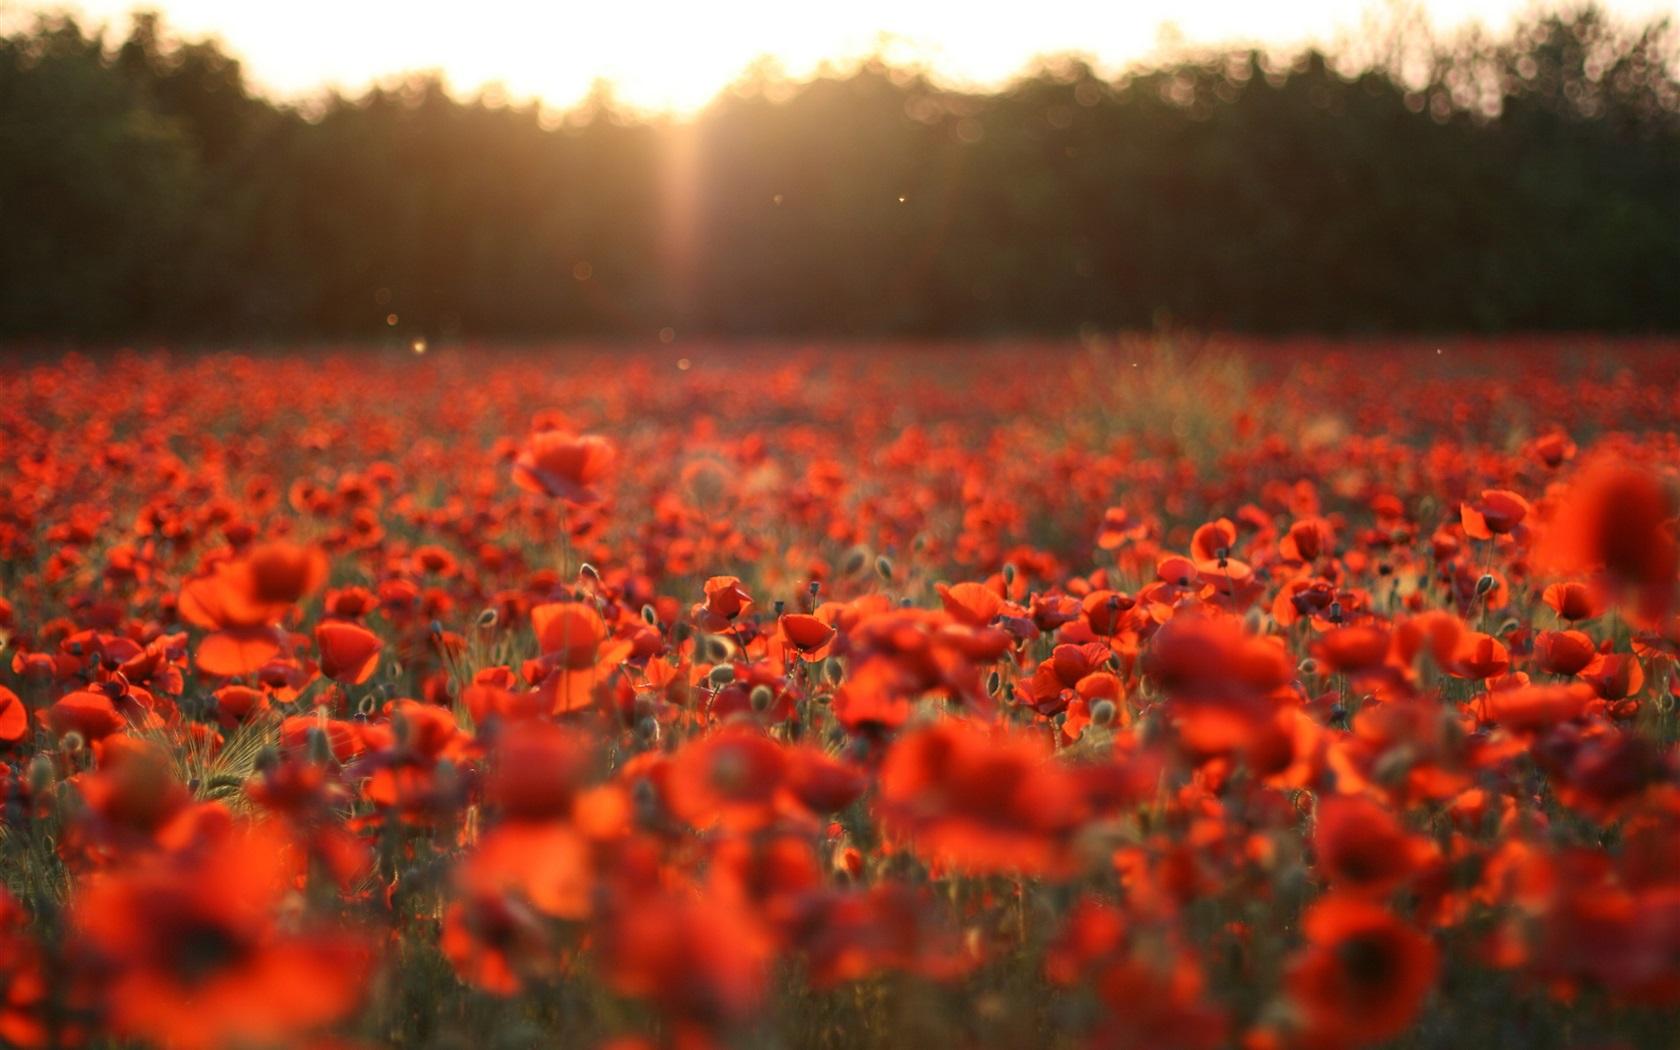 flowers field sun rays Wallpaper | 1680x1050 resolution wallpaper HD Wide Wallpaper for Widescreen